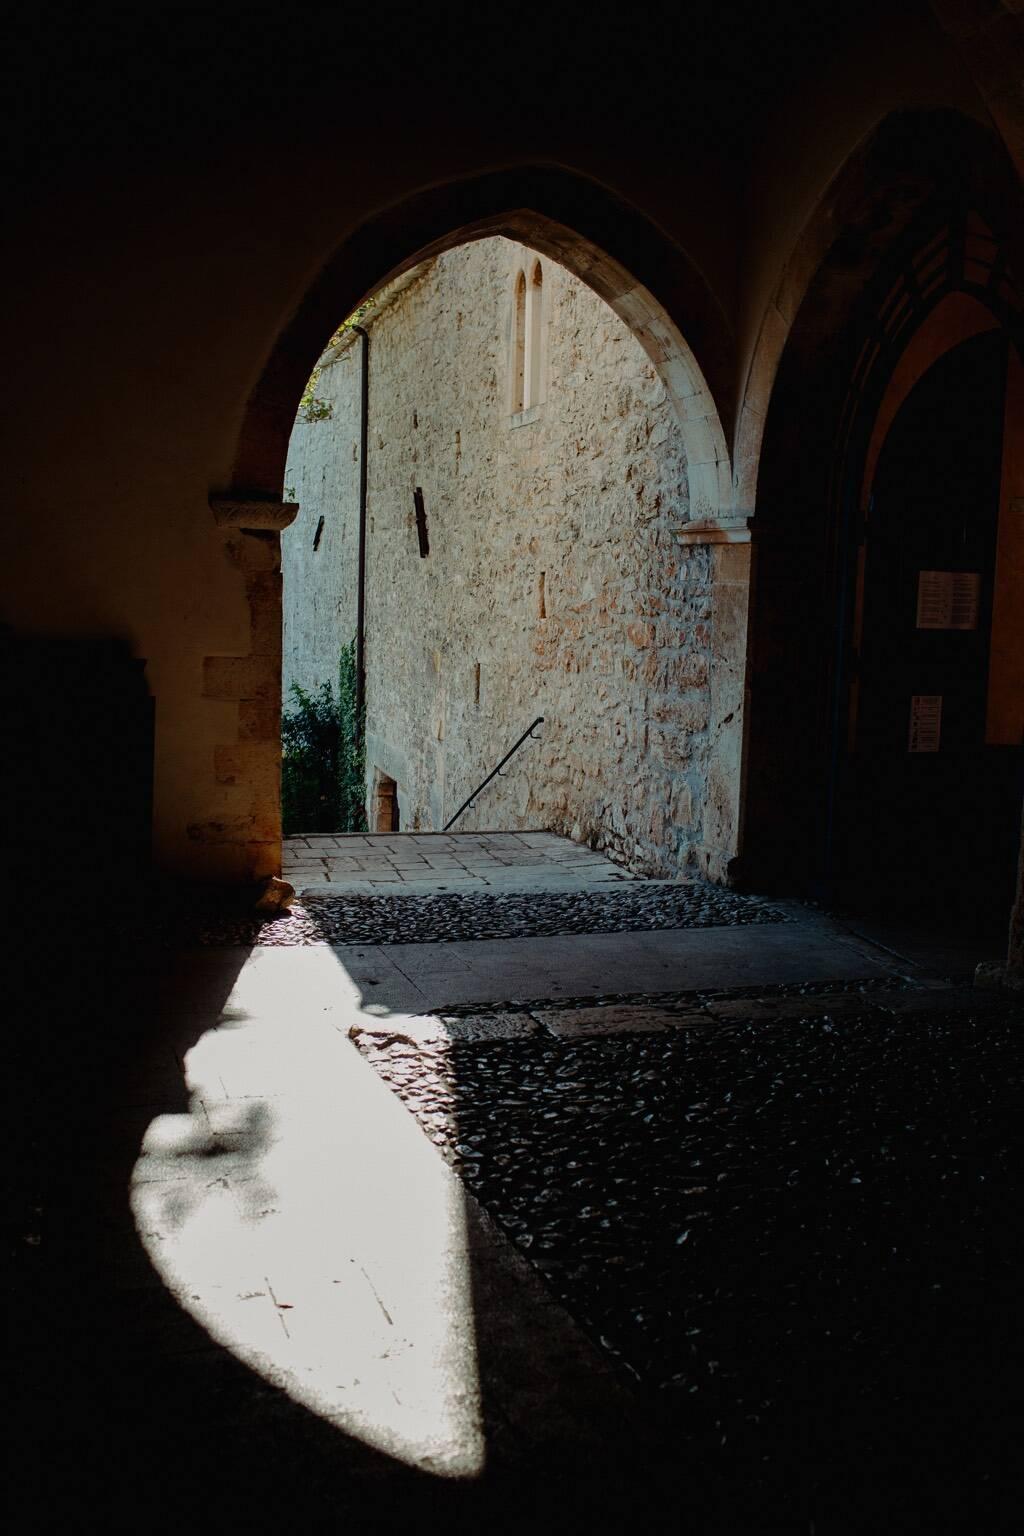 monastero ocre